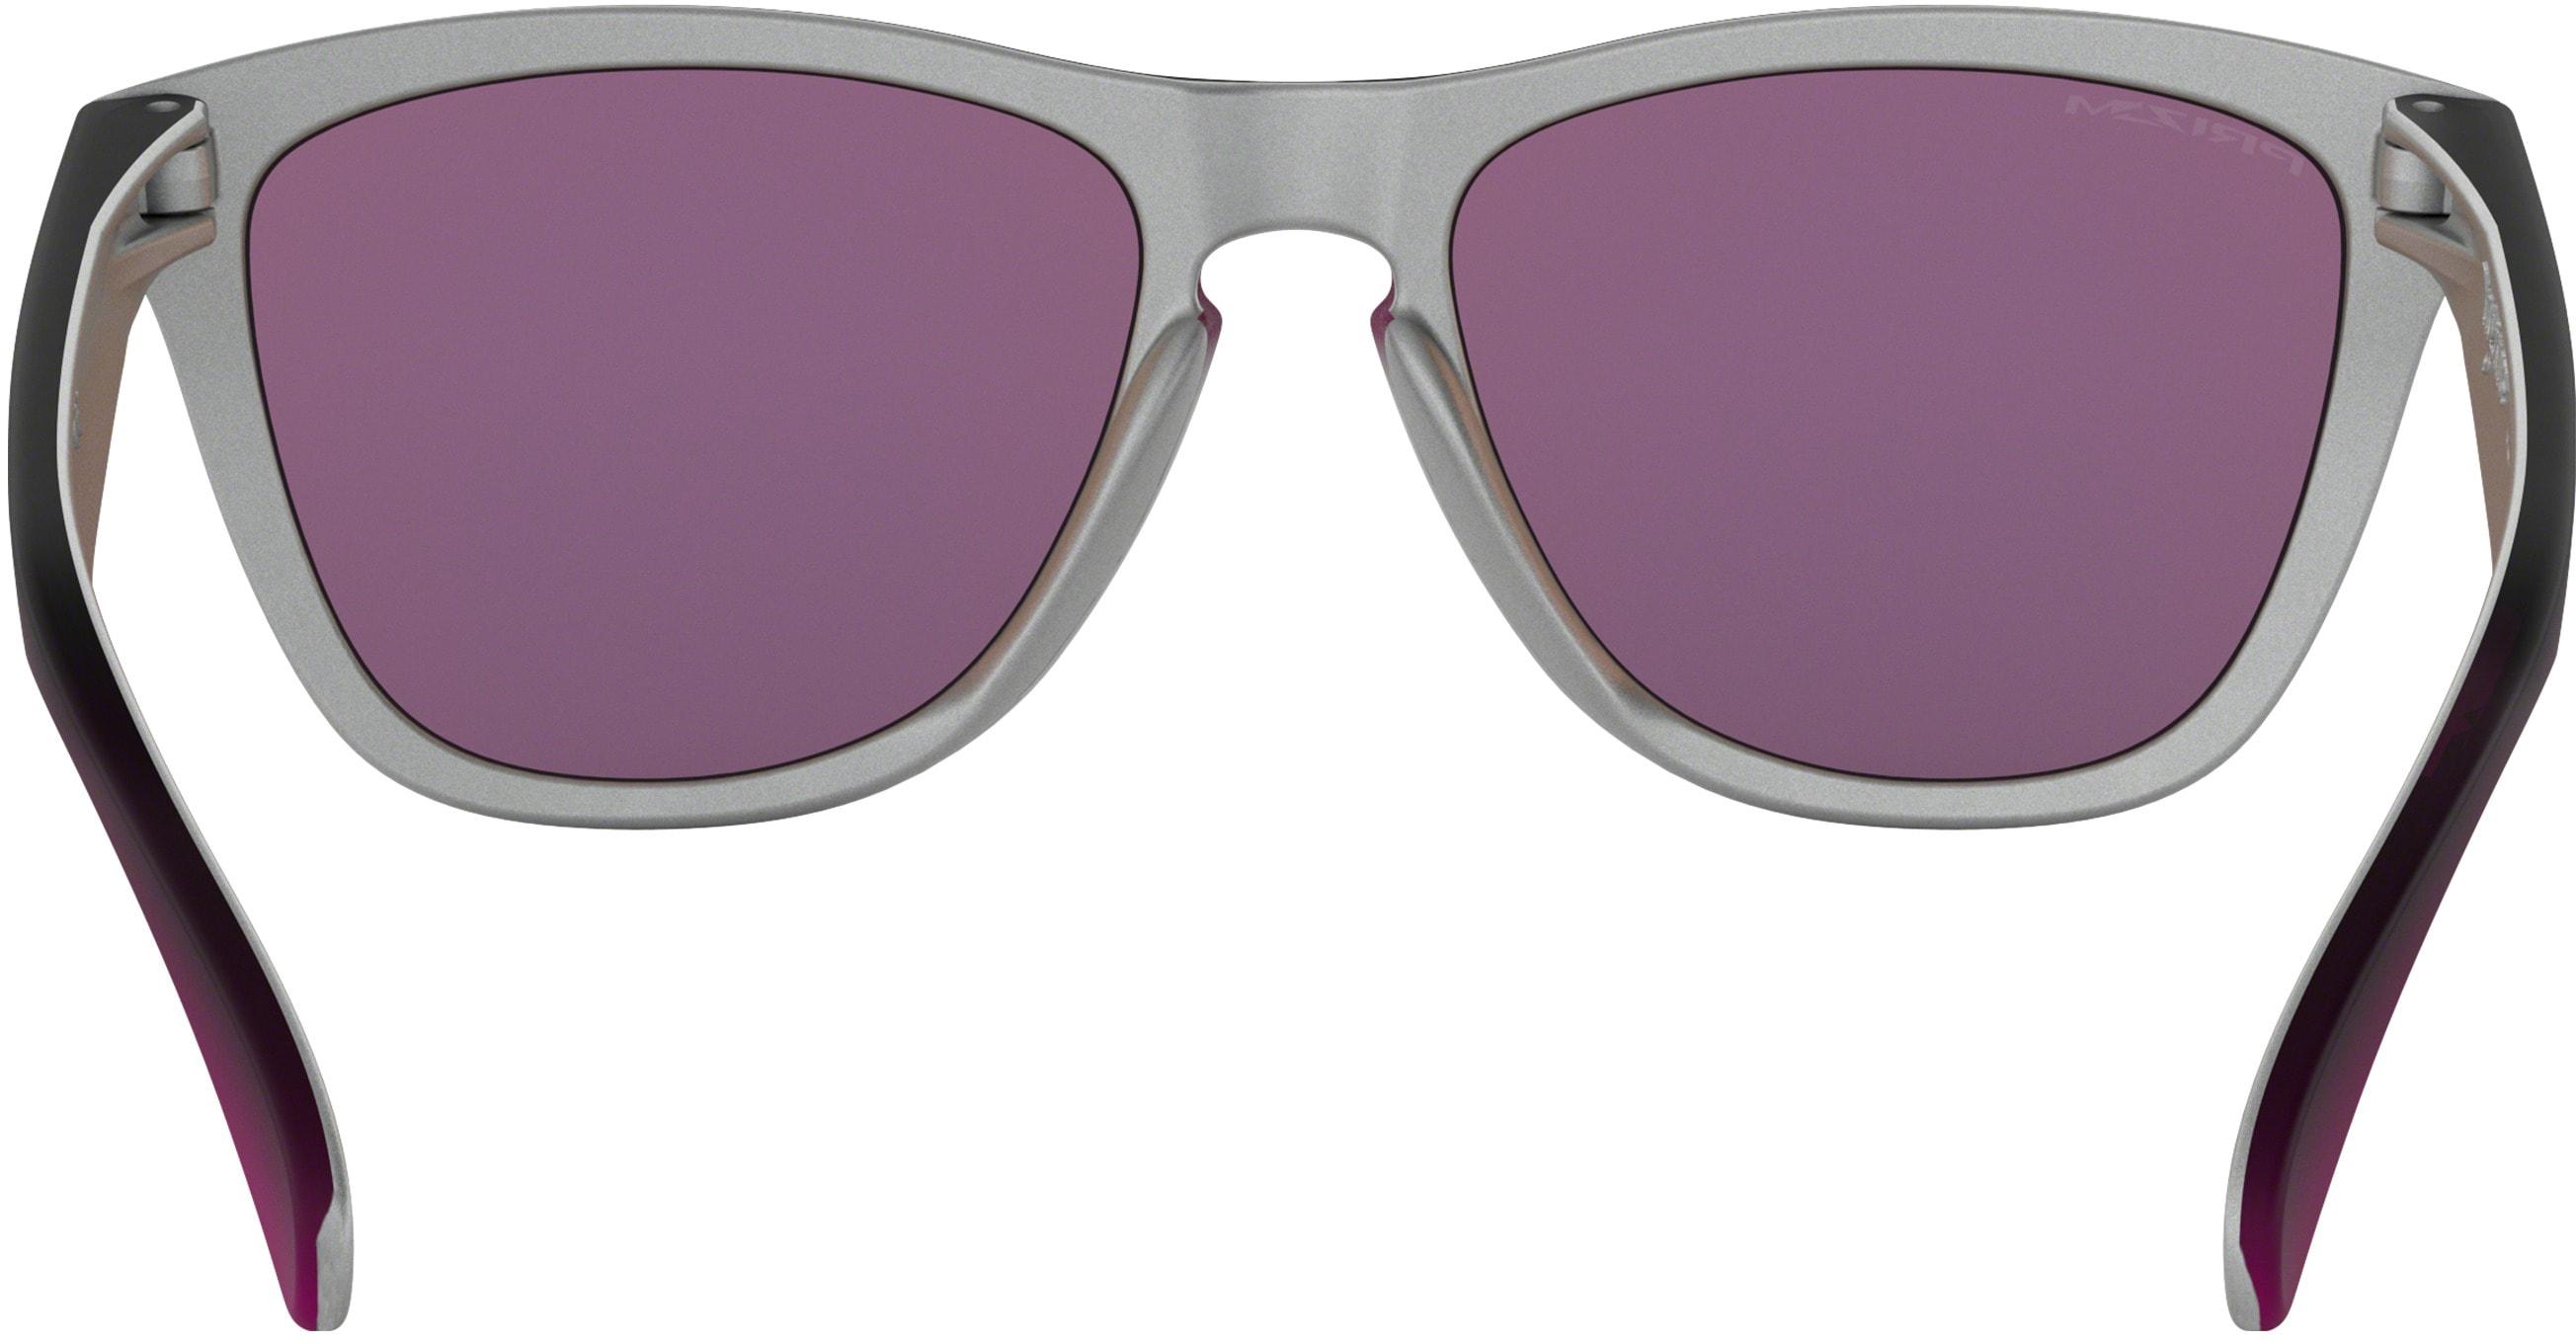 e4e330da66 Oakley Frogskins Splatterfade Collection Sunglasses - thumbnail 3